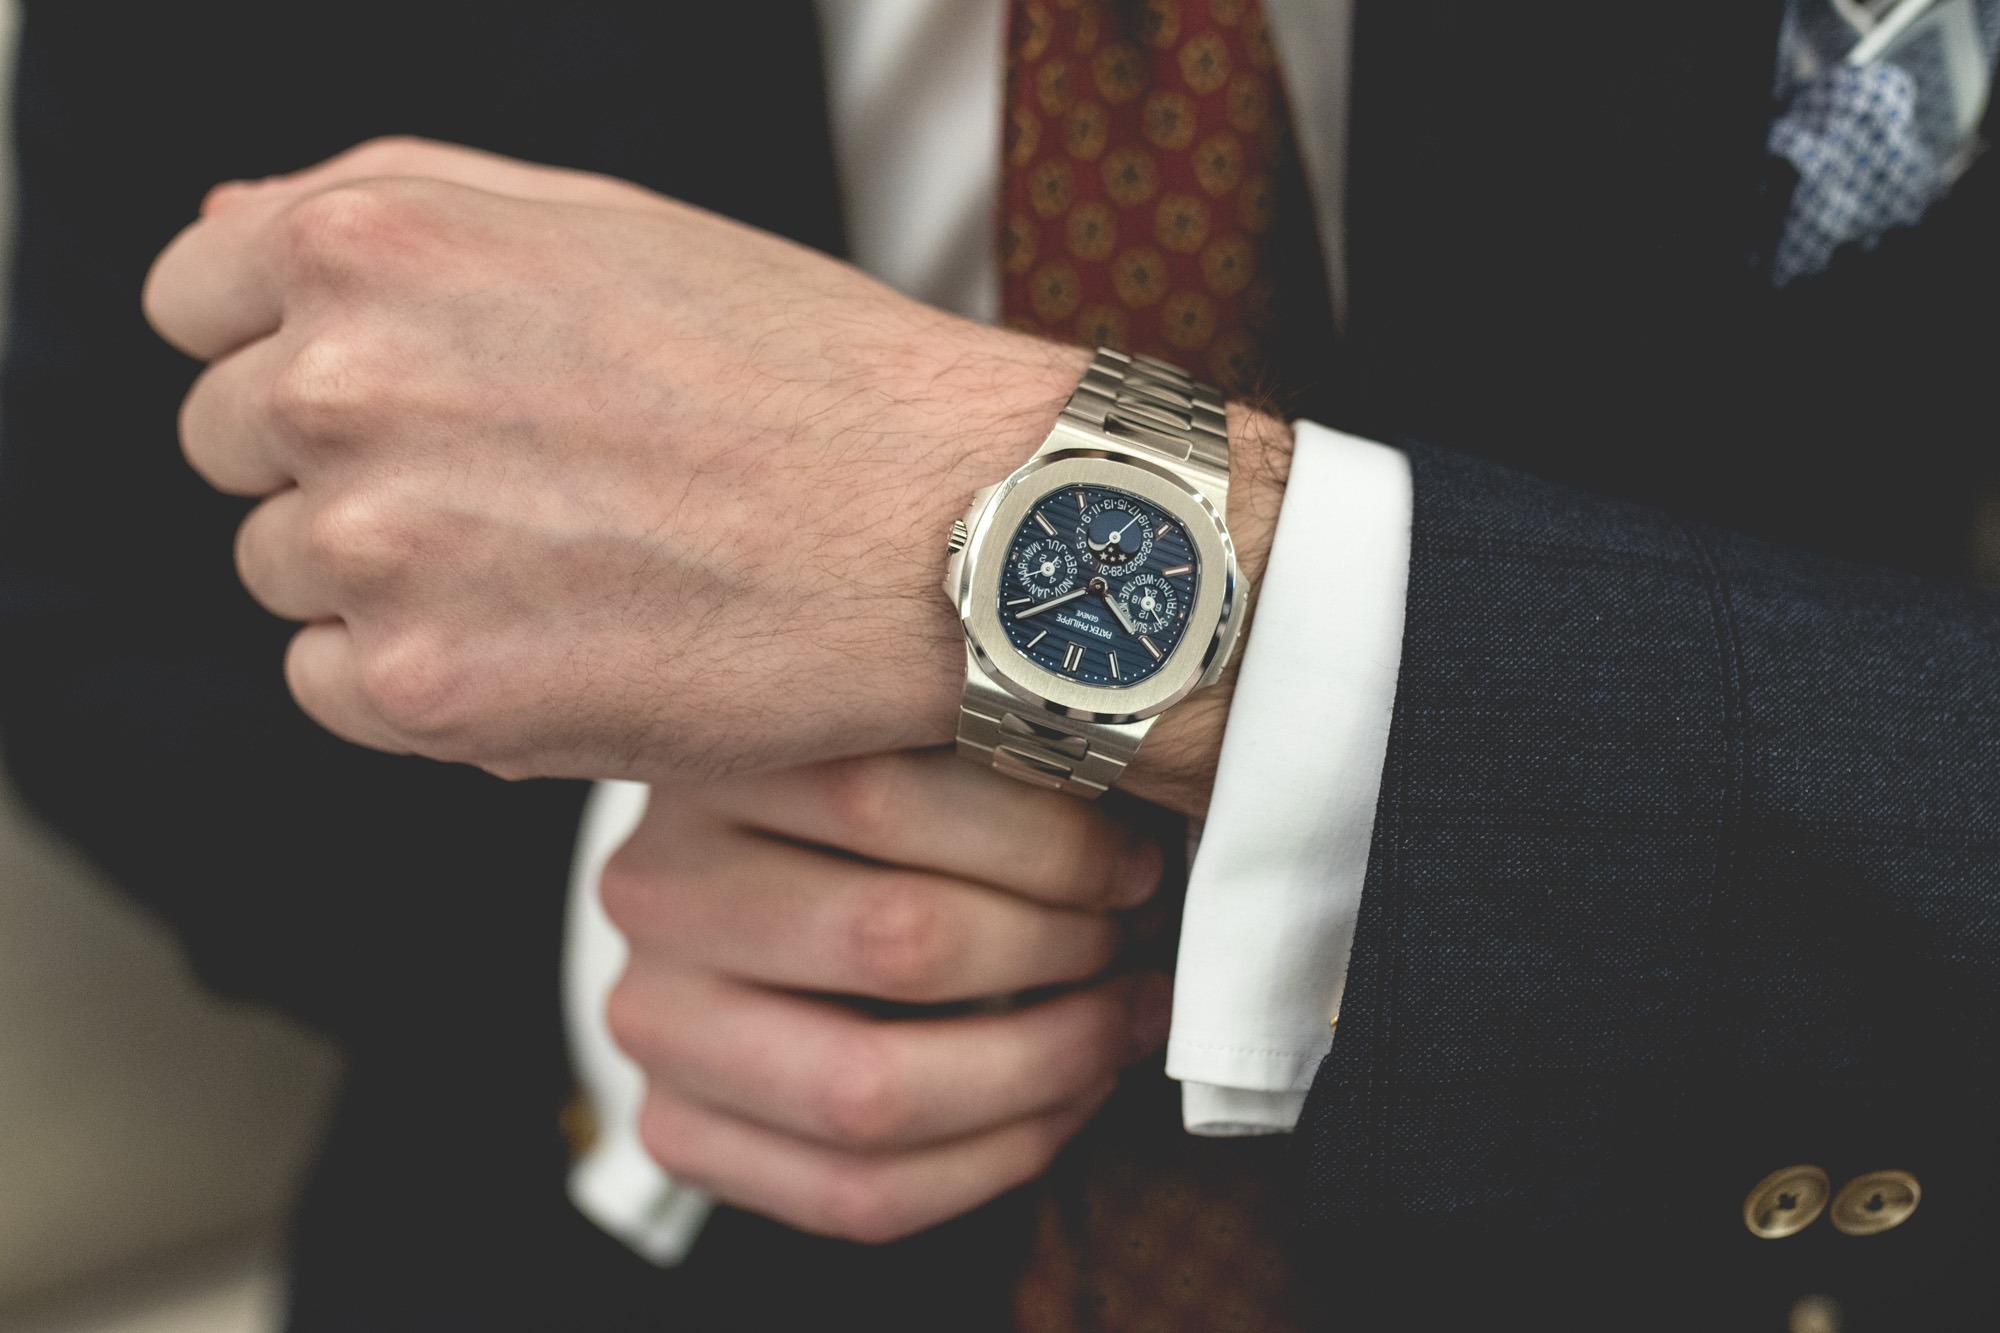 Baselworld 2018 : Patek Philippe Nautilus Perpetual Calendar Wrist